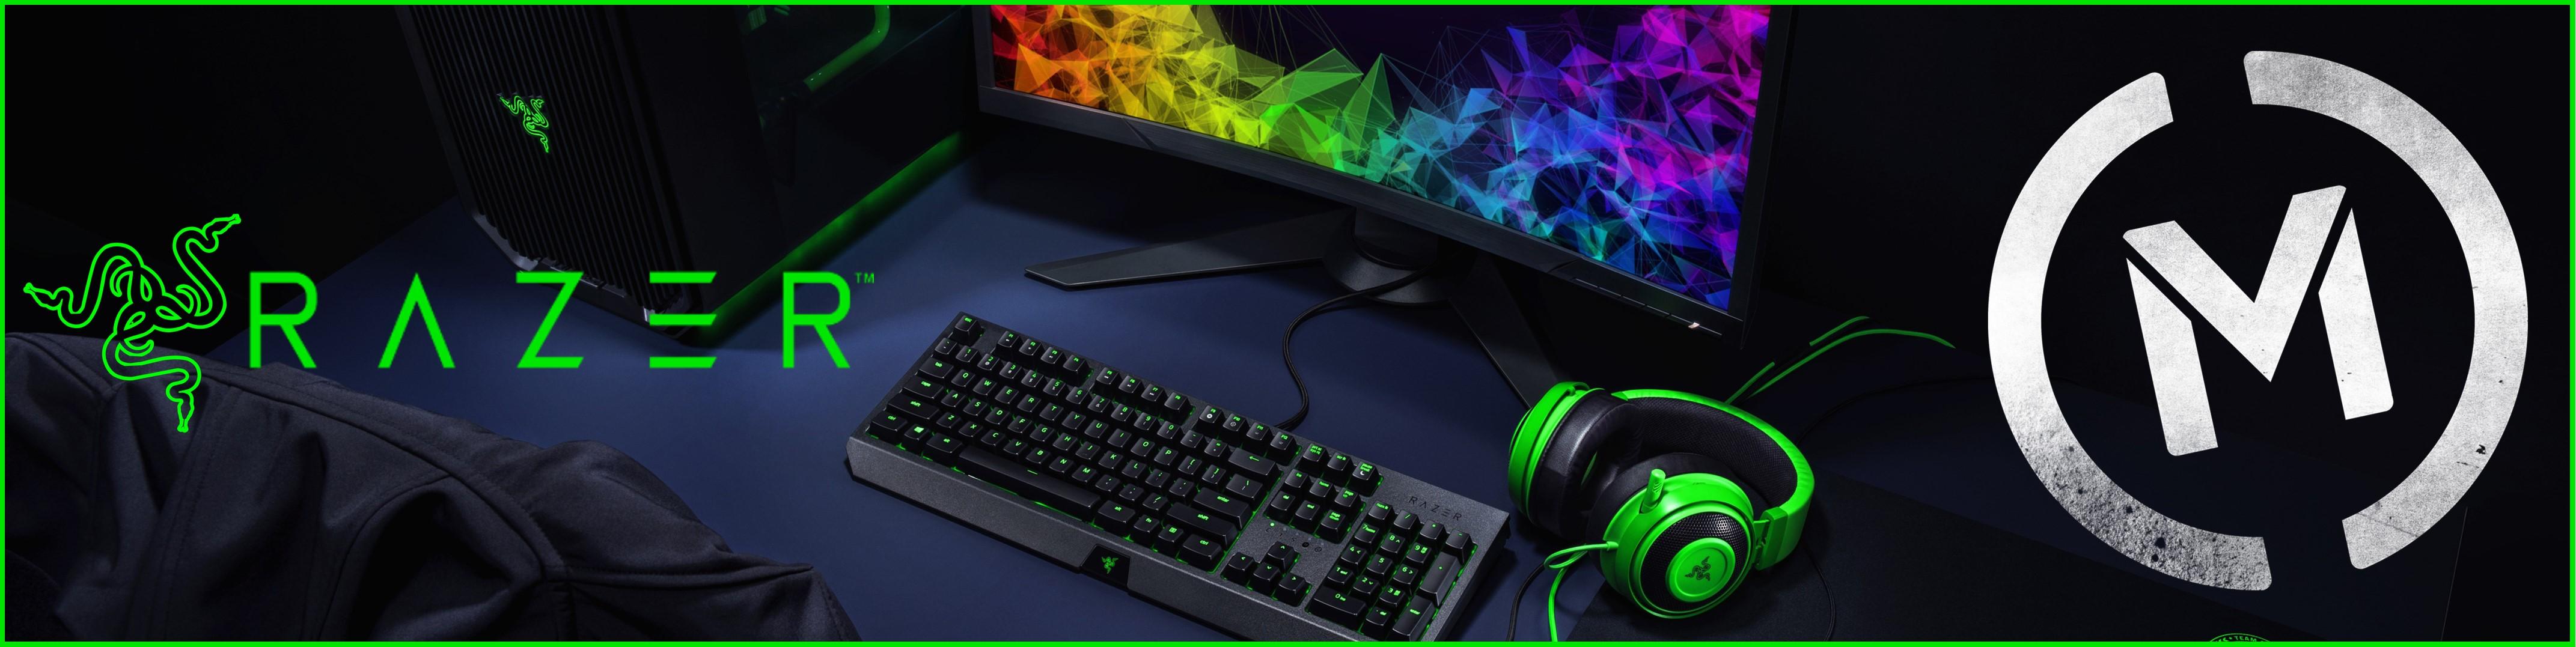 Matrix Razer PC Gaming Banner